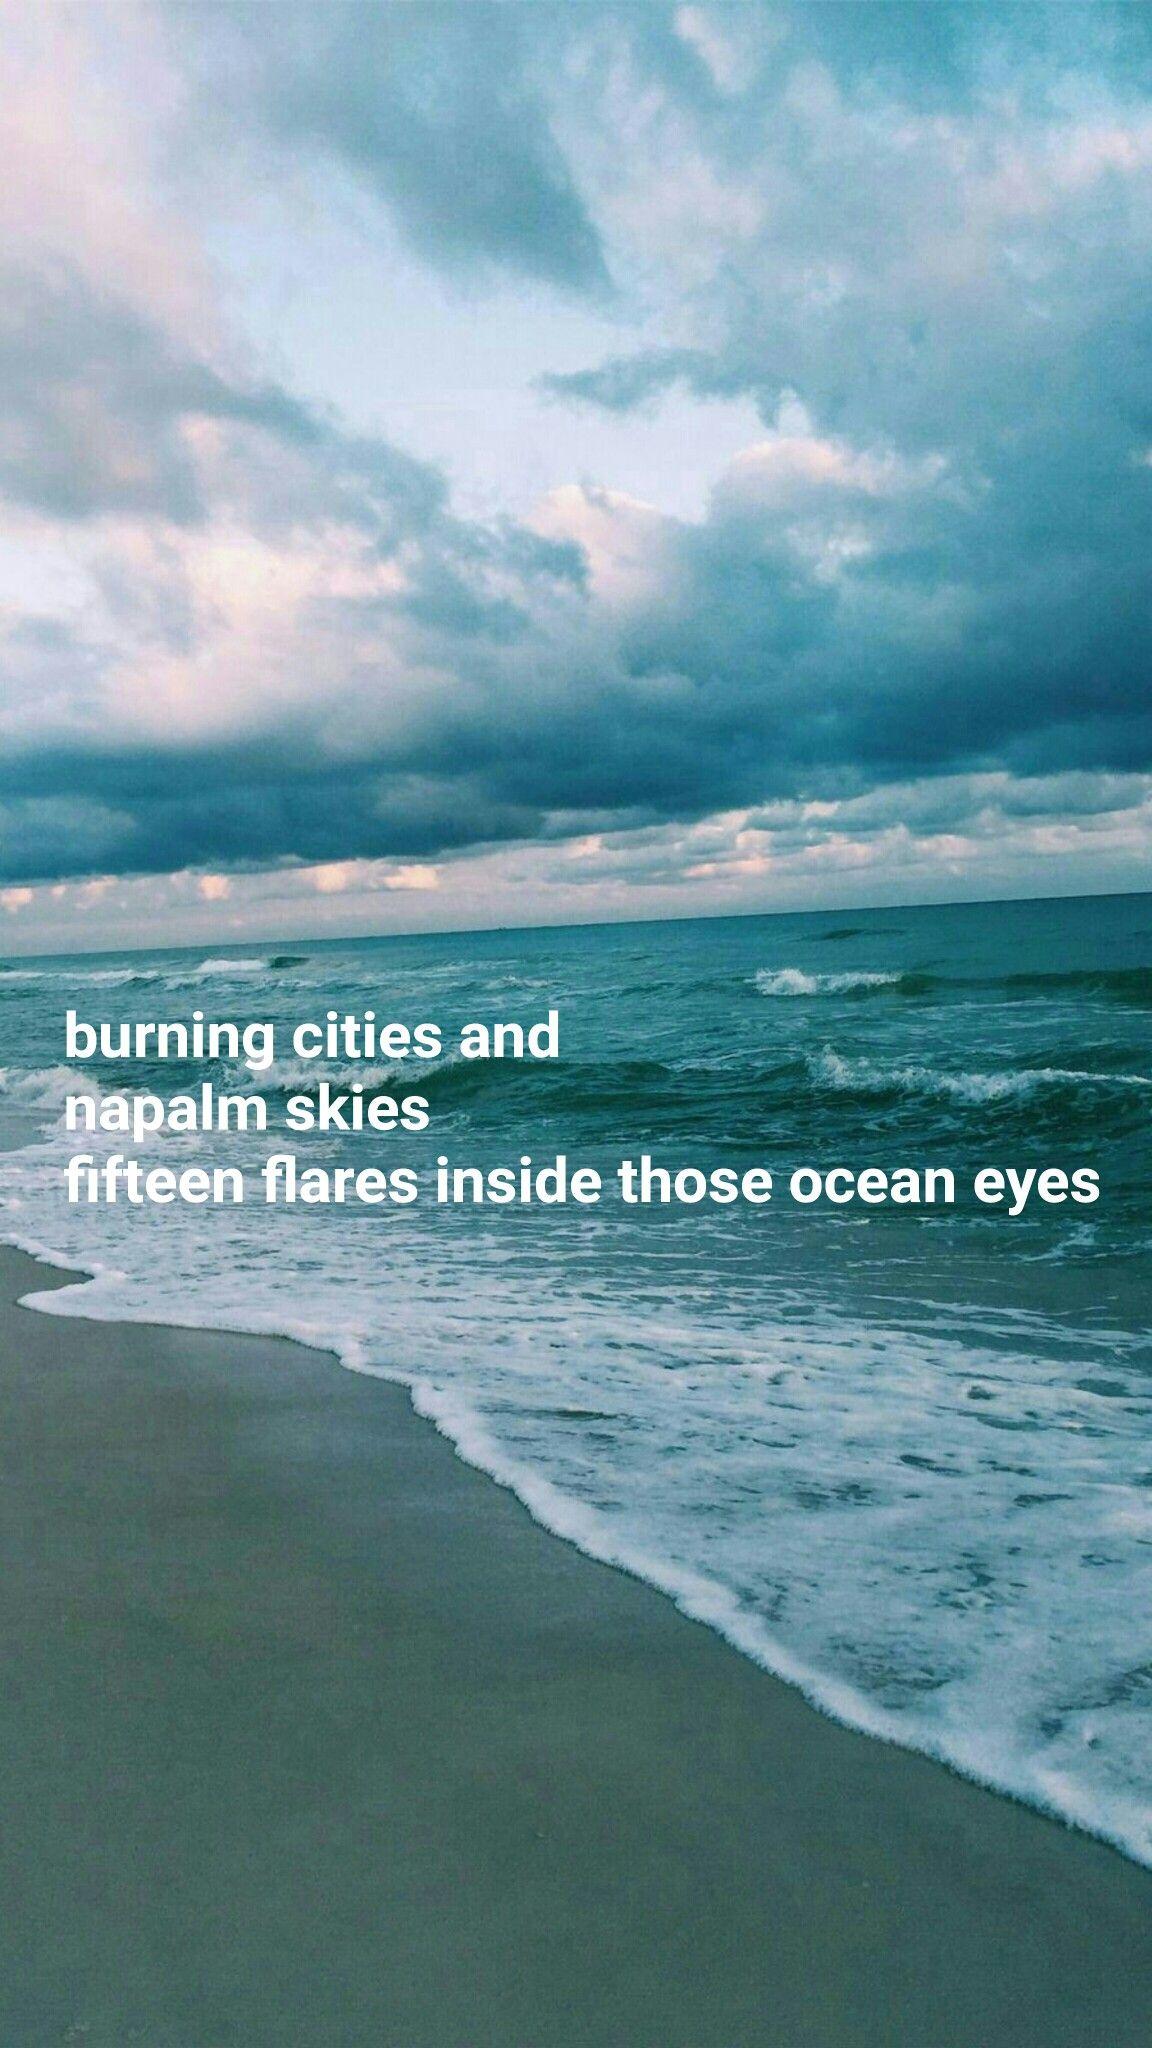 Billie Eilish Ocean Eyes Lyrics Wallpaper Aesthetic Iphone Android Ocean Eyes Lyrics Billie Eilish Ocean Eyes Lyrics Aesthetic